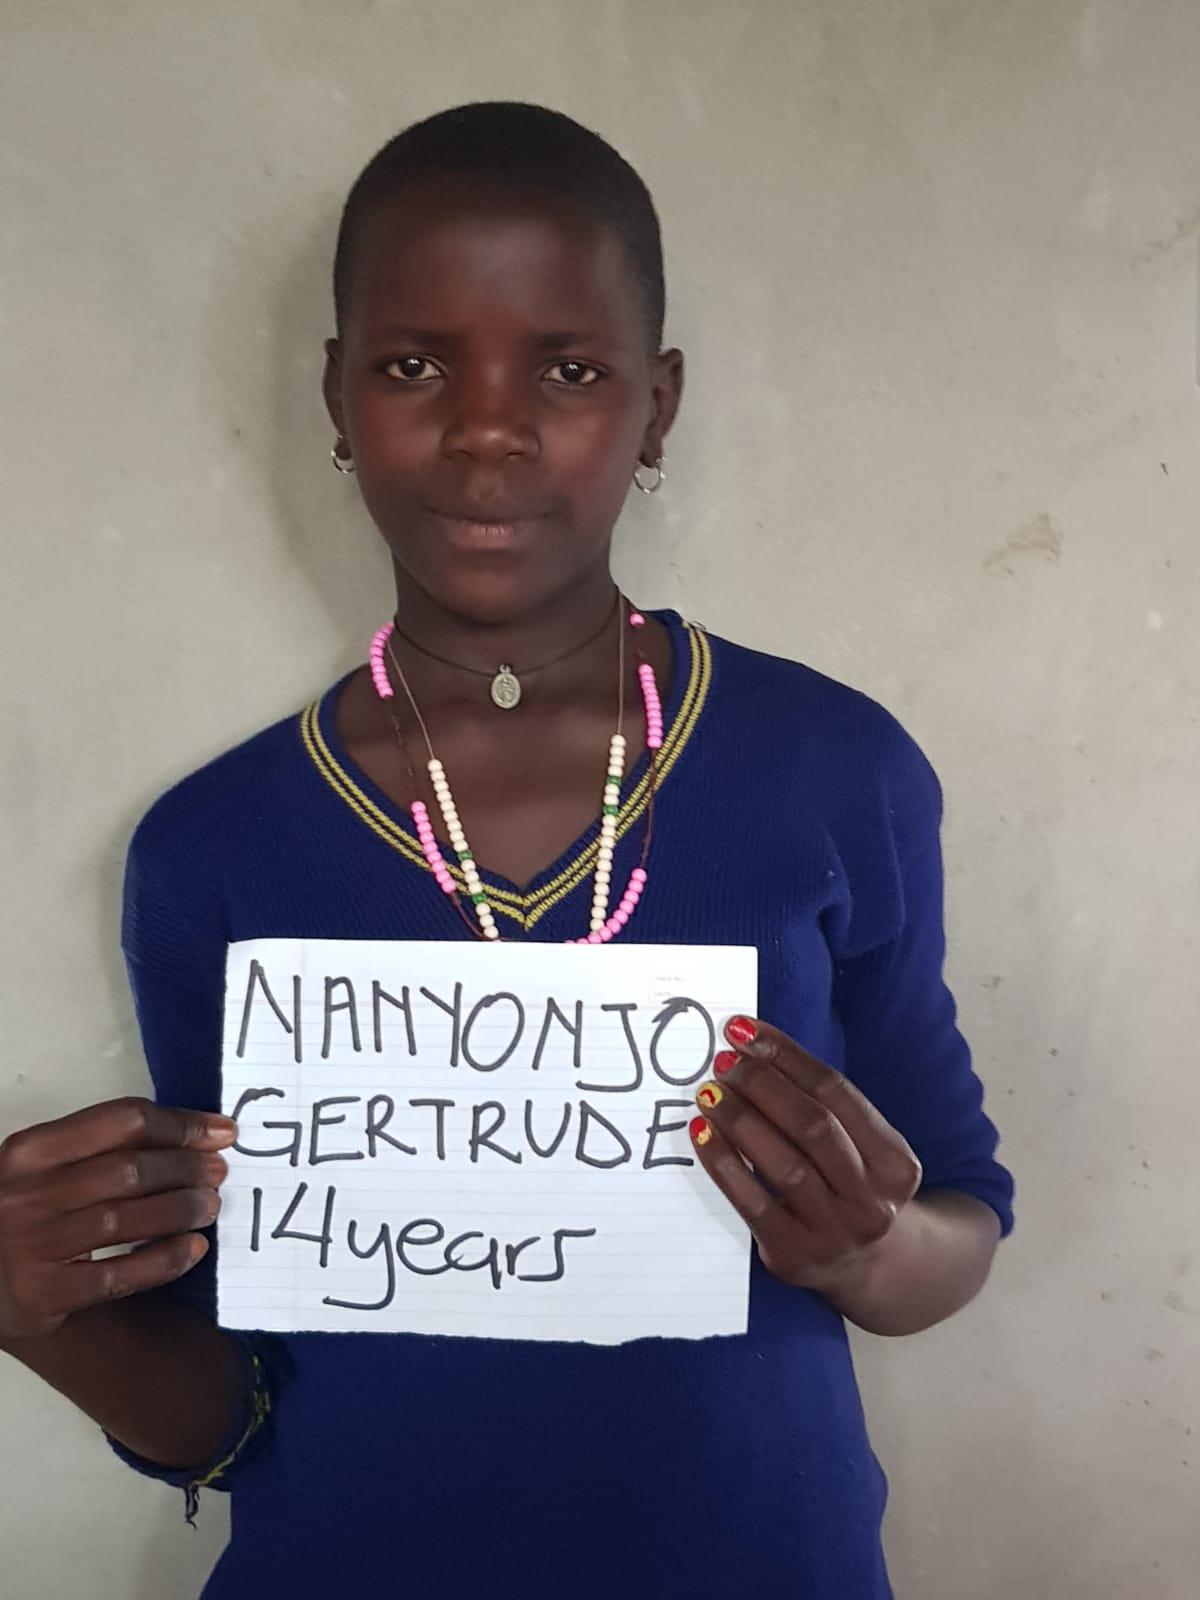 Nanyonjo, Gertrude